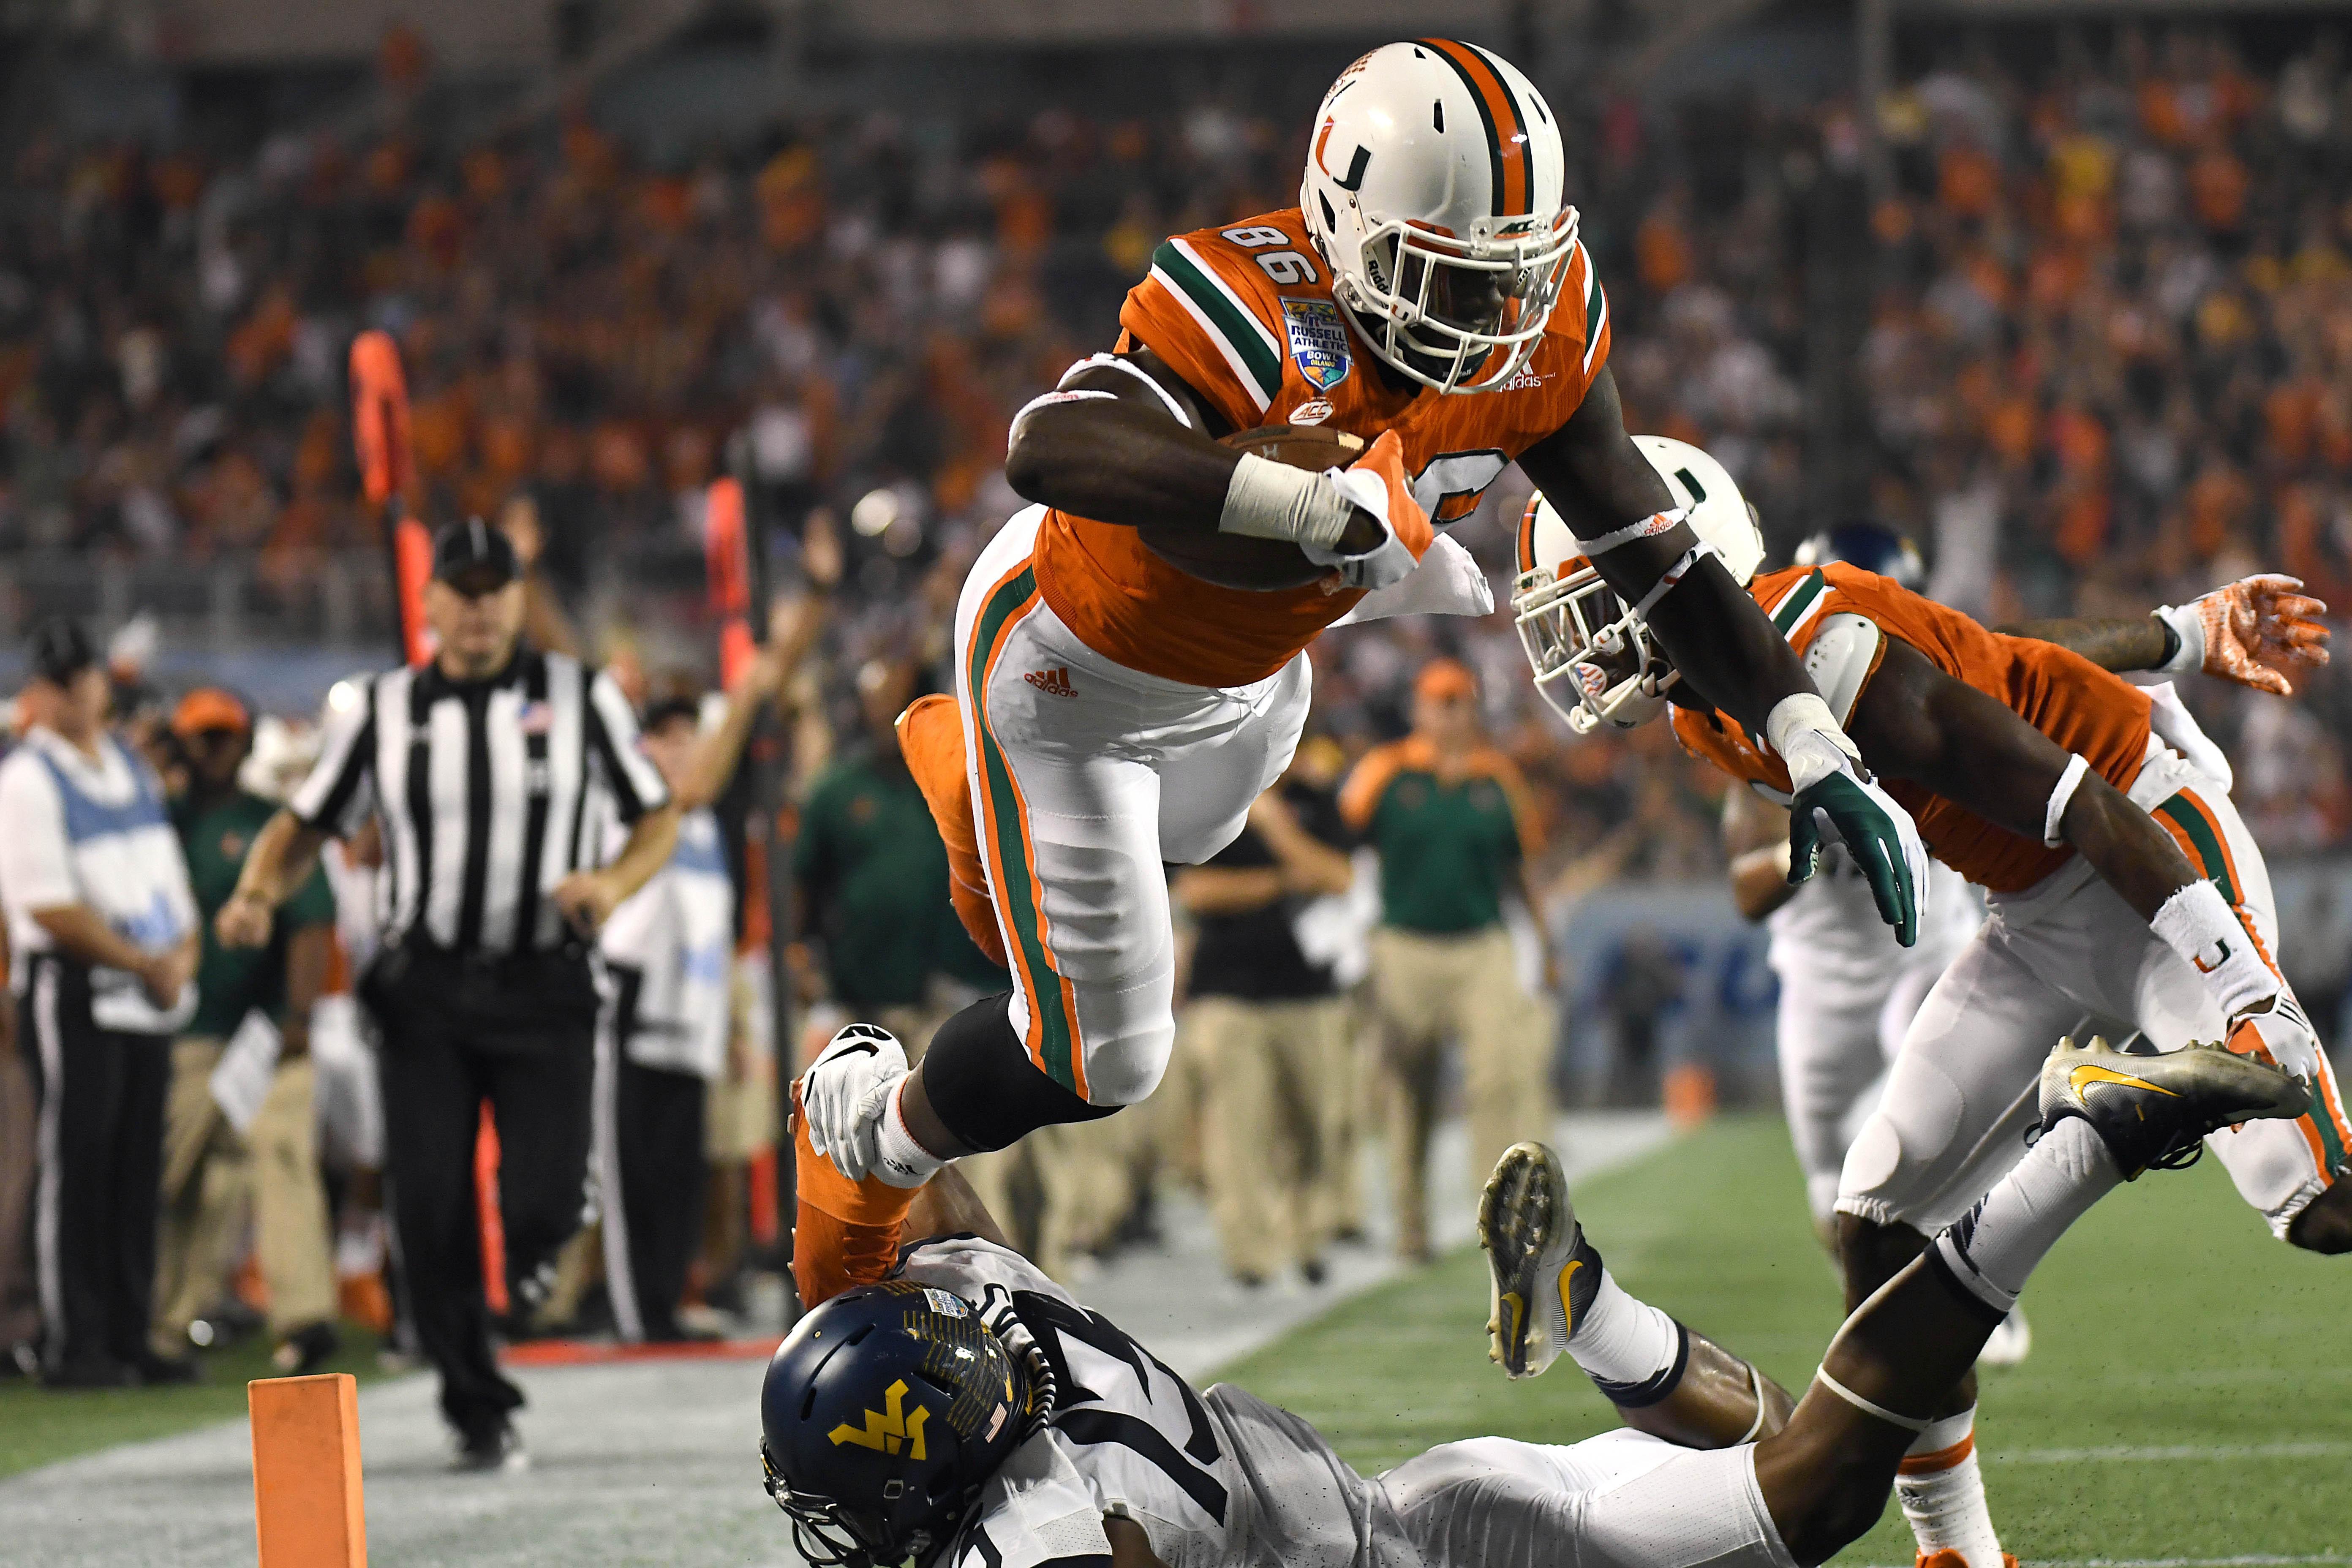 National Football League draft results: Fantasy implications of David Njoku to Cleveland Browns